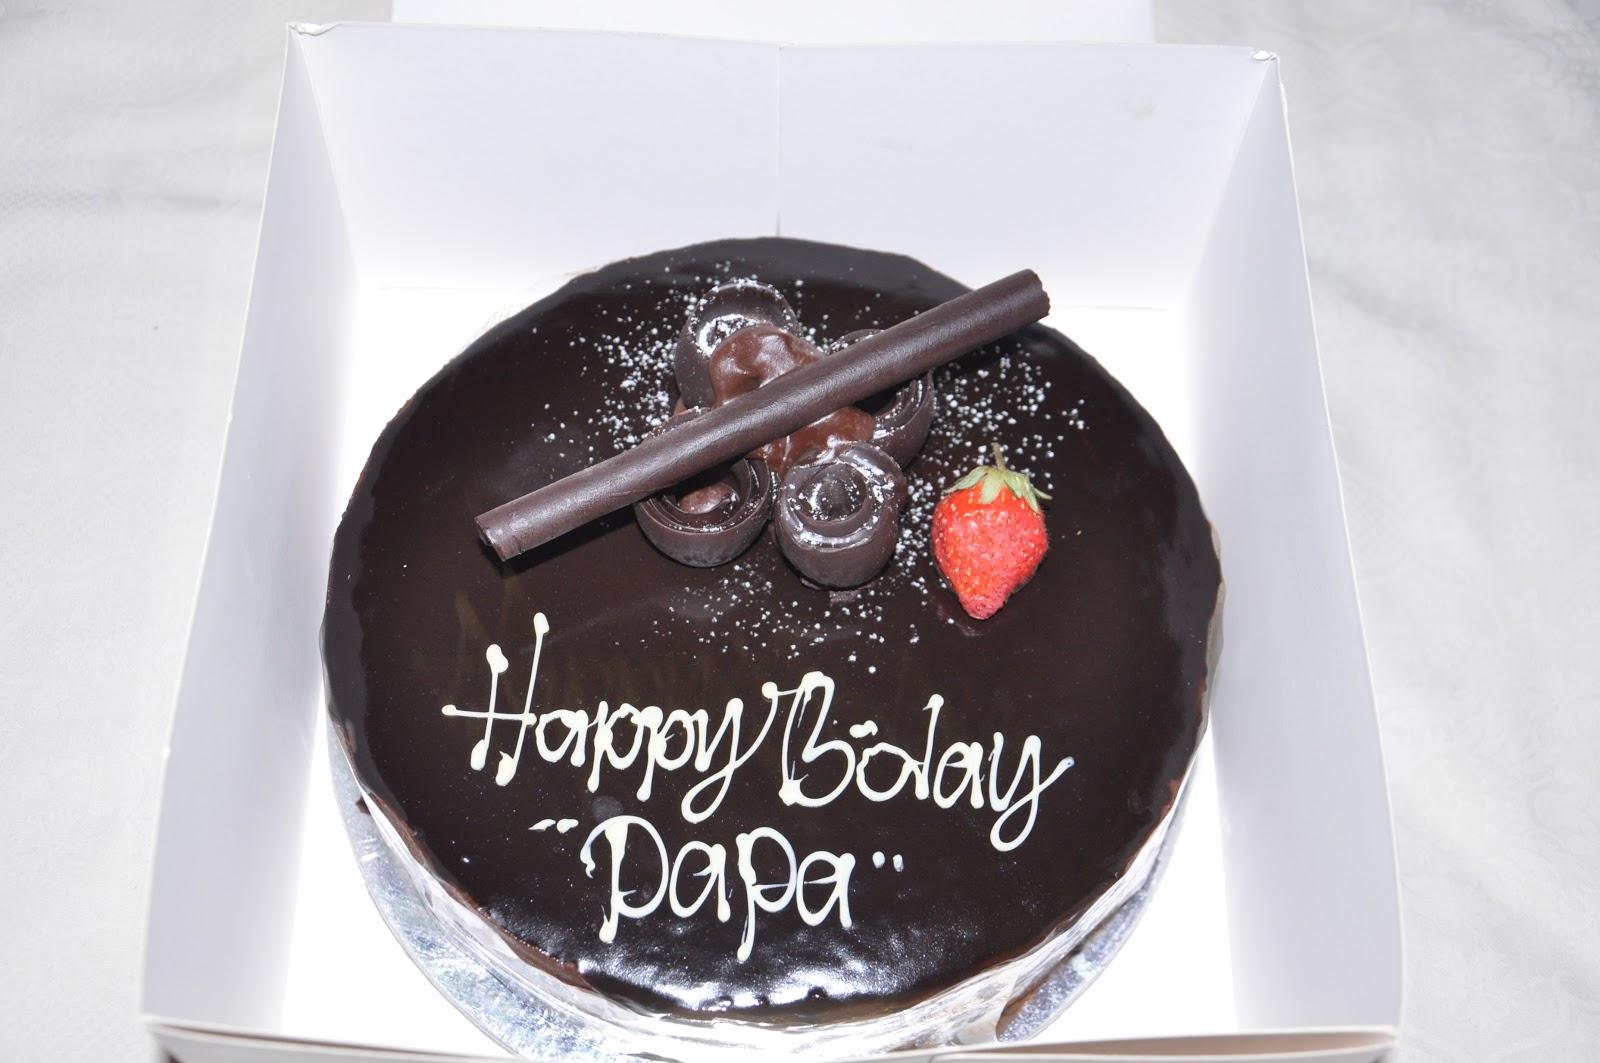 Wonderland Papas Birthday Cake Was Awesome